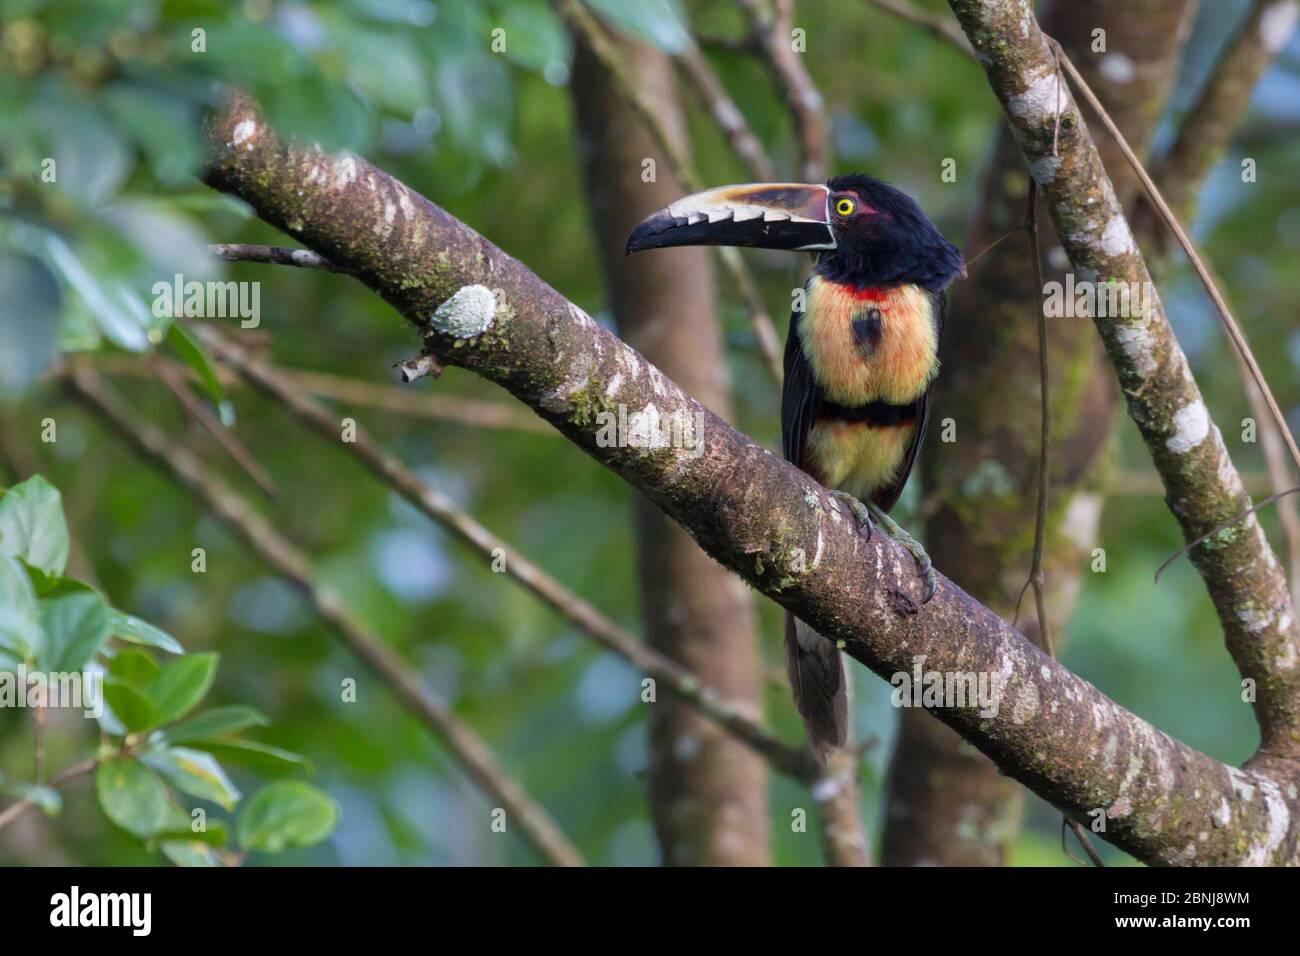 Collared aracari (Pteroglossus torquatus) Cordillera de Talamanca mountain range, Caribbean Slopes, Costa Rica. Stock Photo